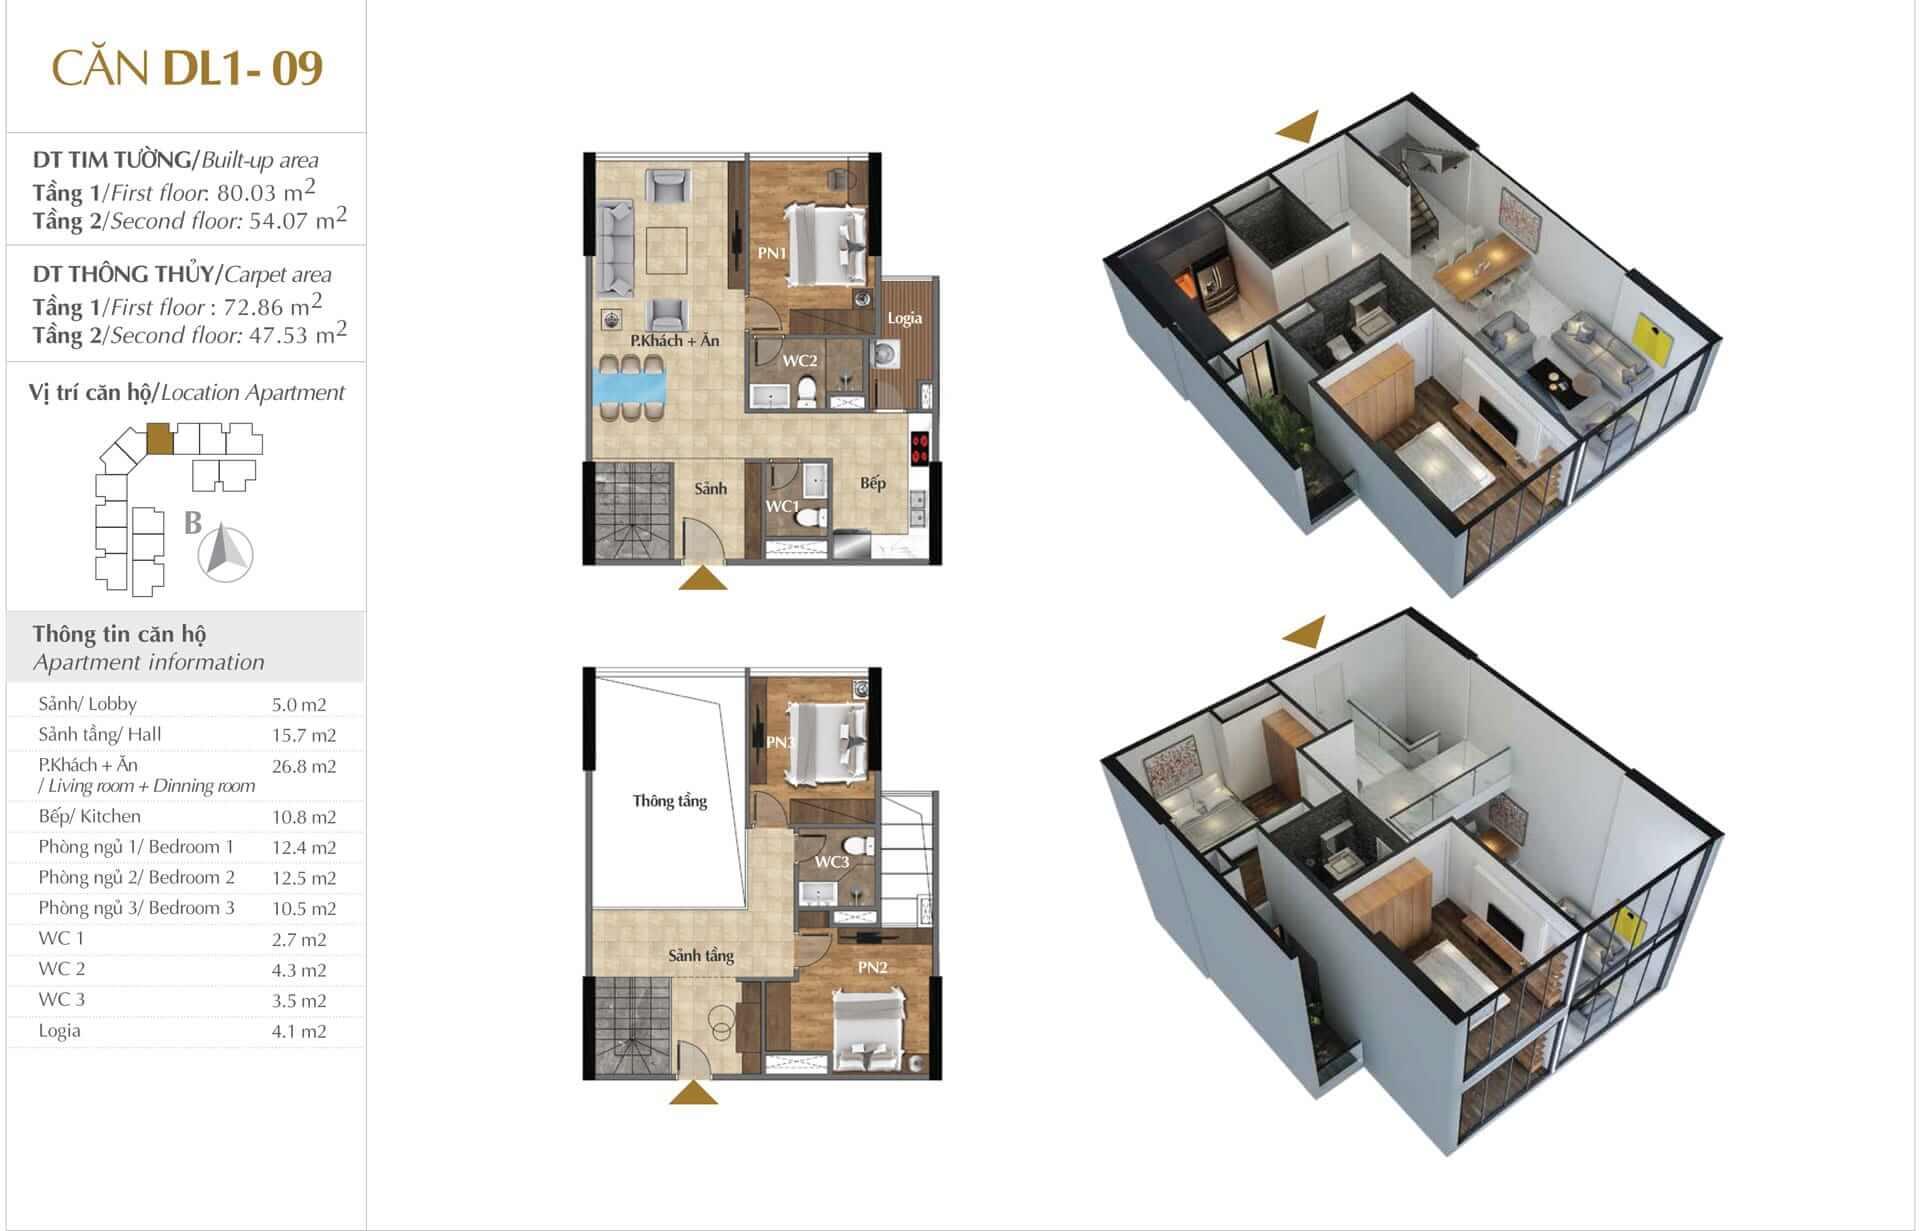 Thiết kế căn DL1 - 09